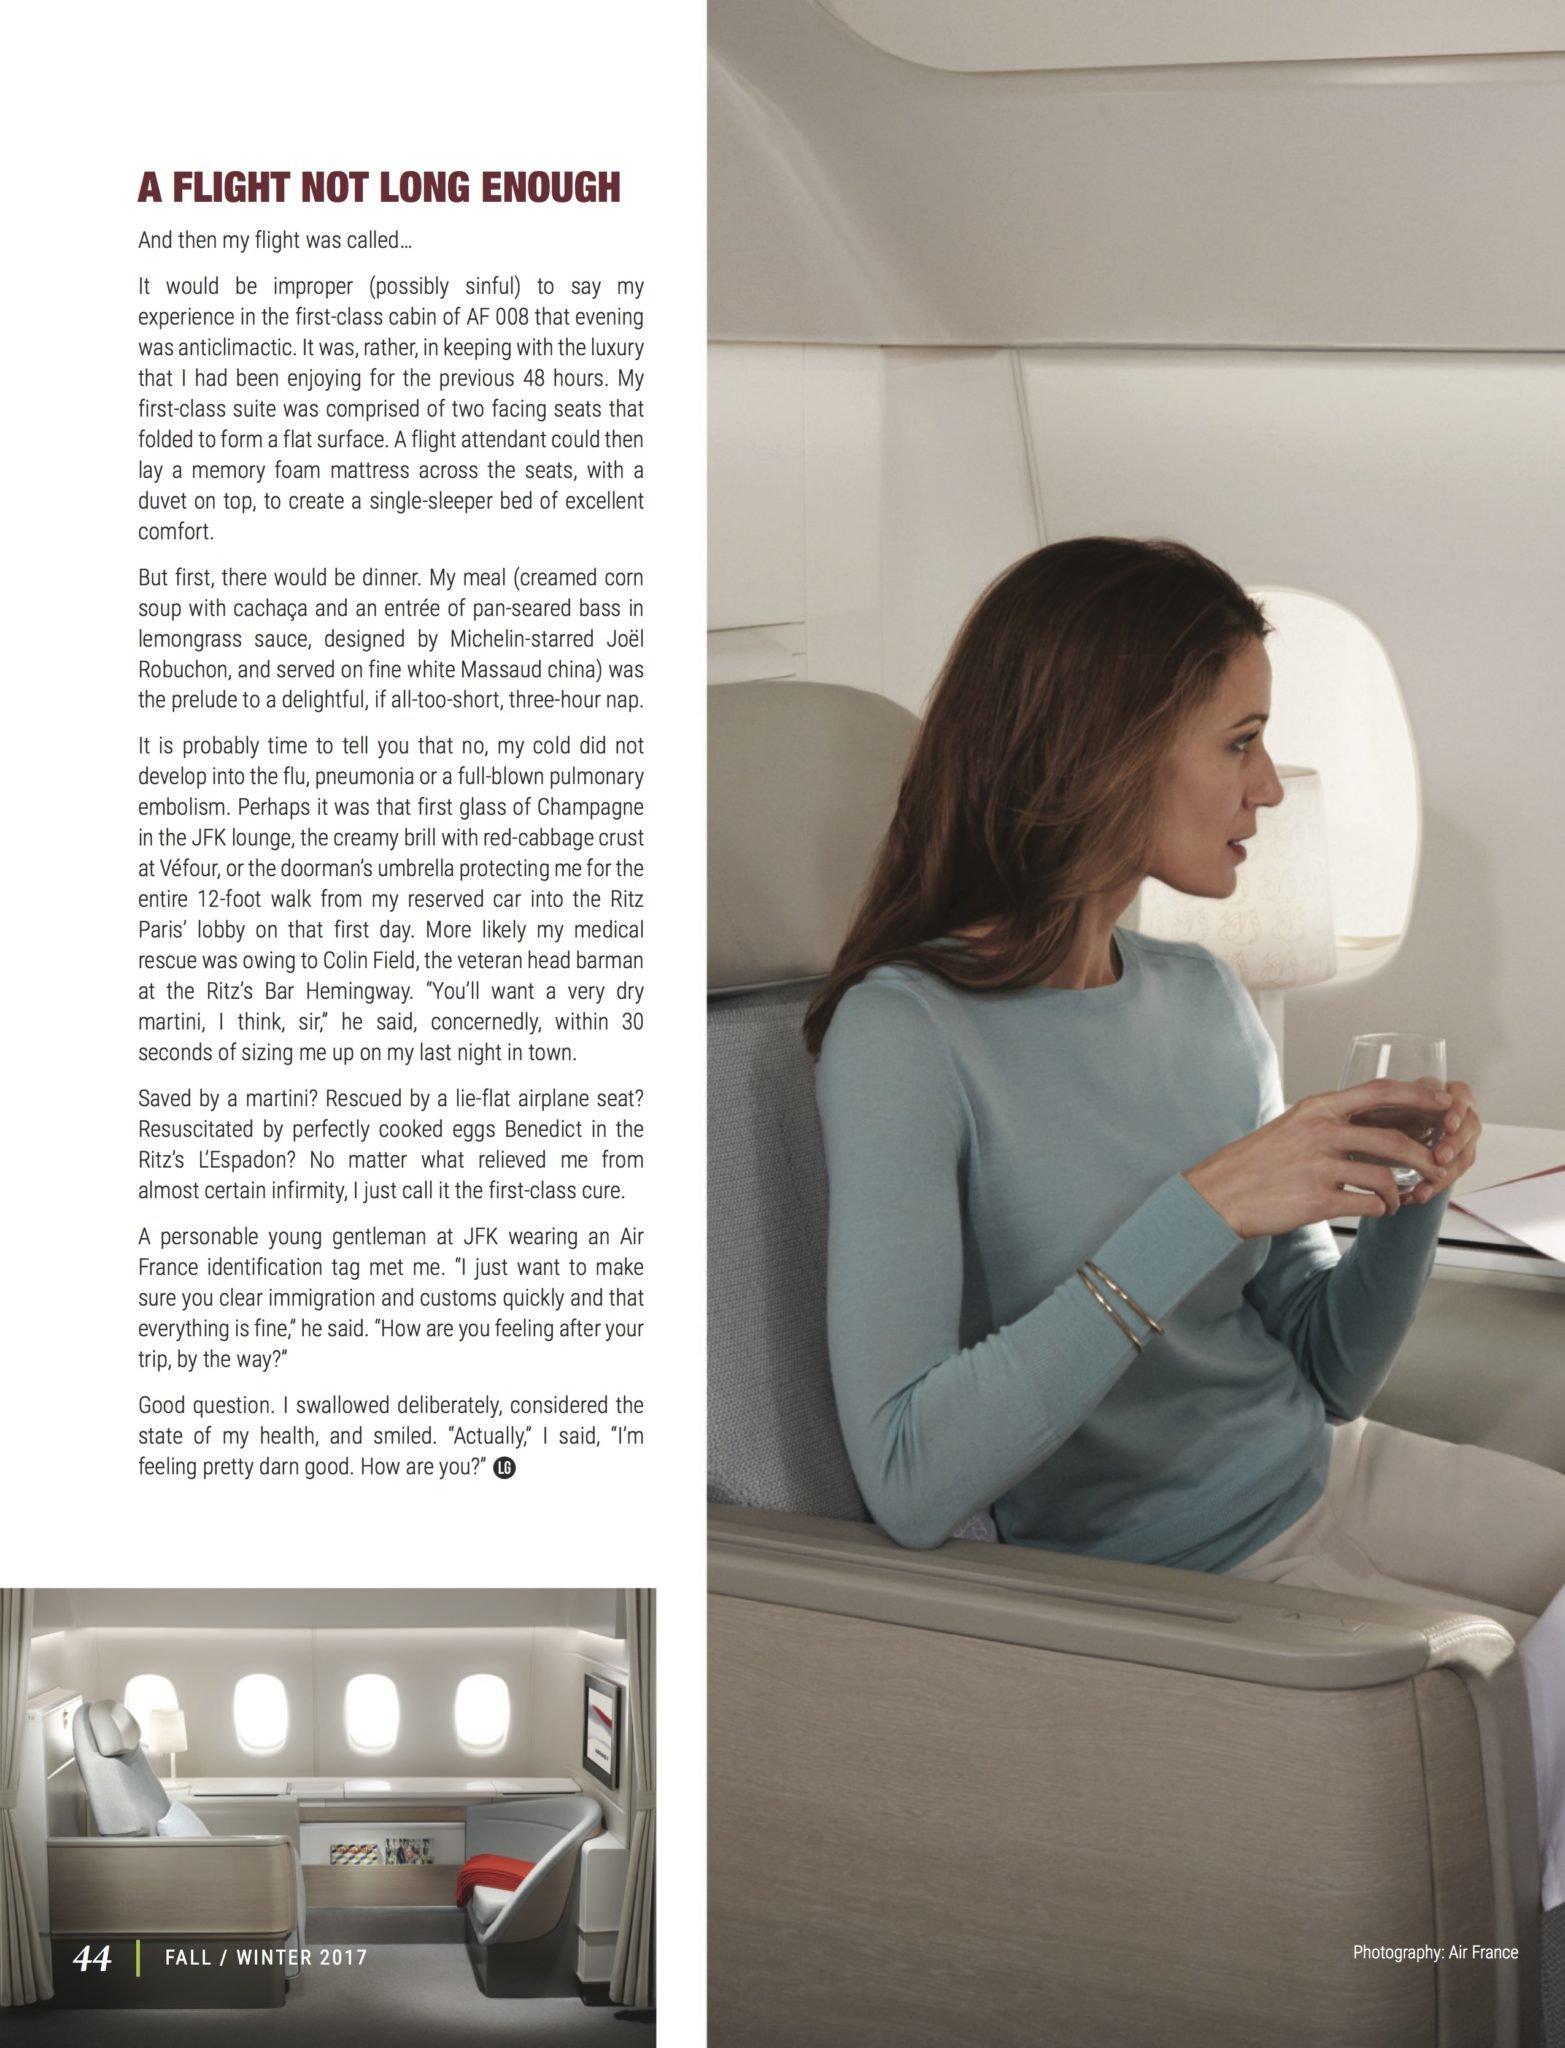 LuxeGetaways - Luxury Travel - Luxury Travel Magazine - Luxe Getaways - Luxury Lifestyle - Fall/Winter 2017 Magazine Issue - Digital Magazine - Travel Magazine - Air France - Ritz Paris - Mark Orwoll